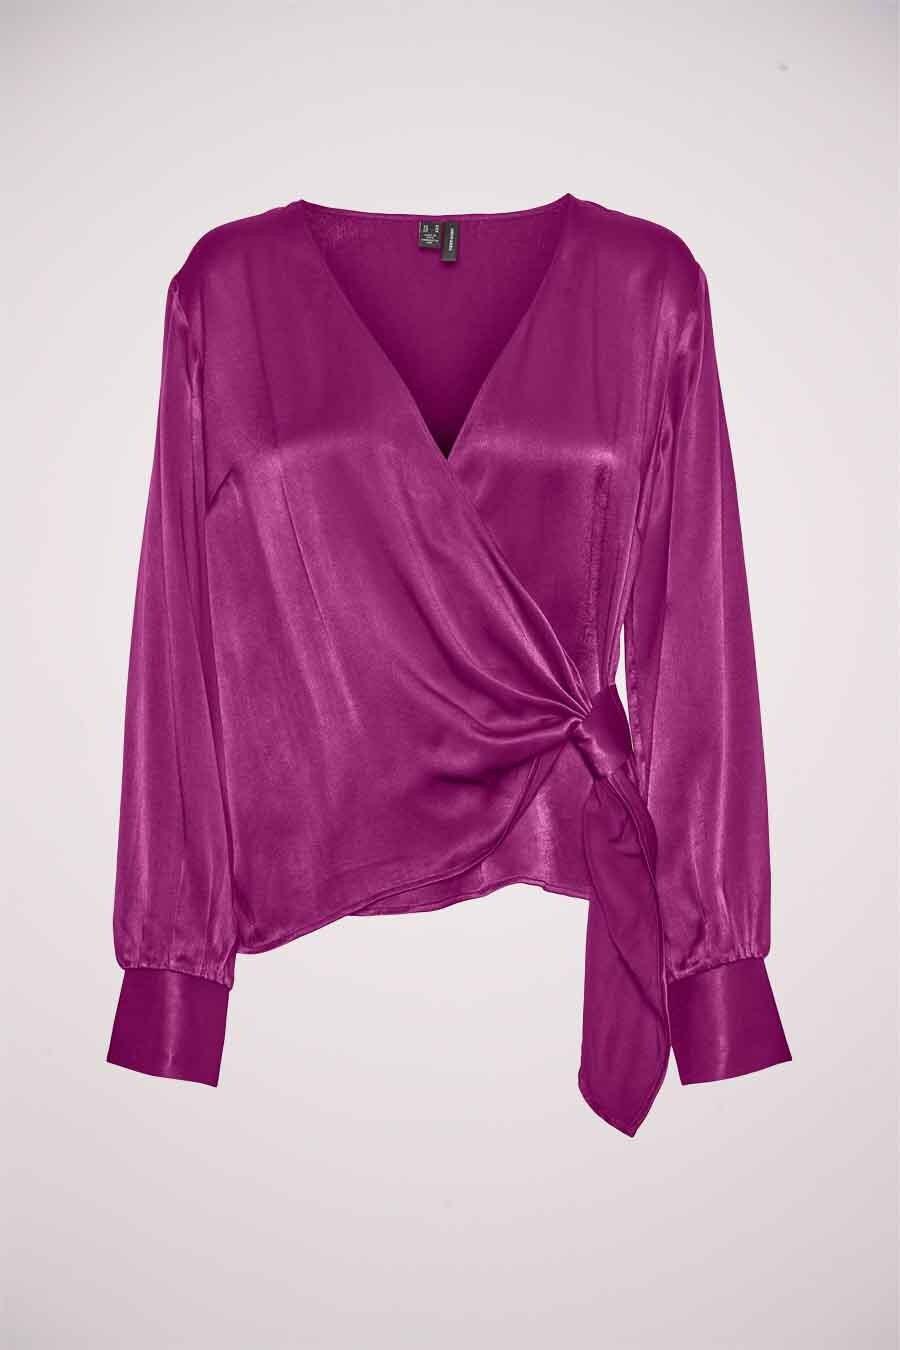 Vero Moda® Blouse lange mouwen, Roze, Dames, Maat: M/S